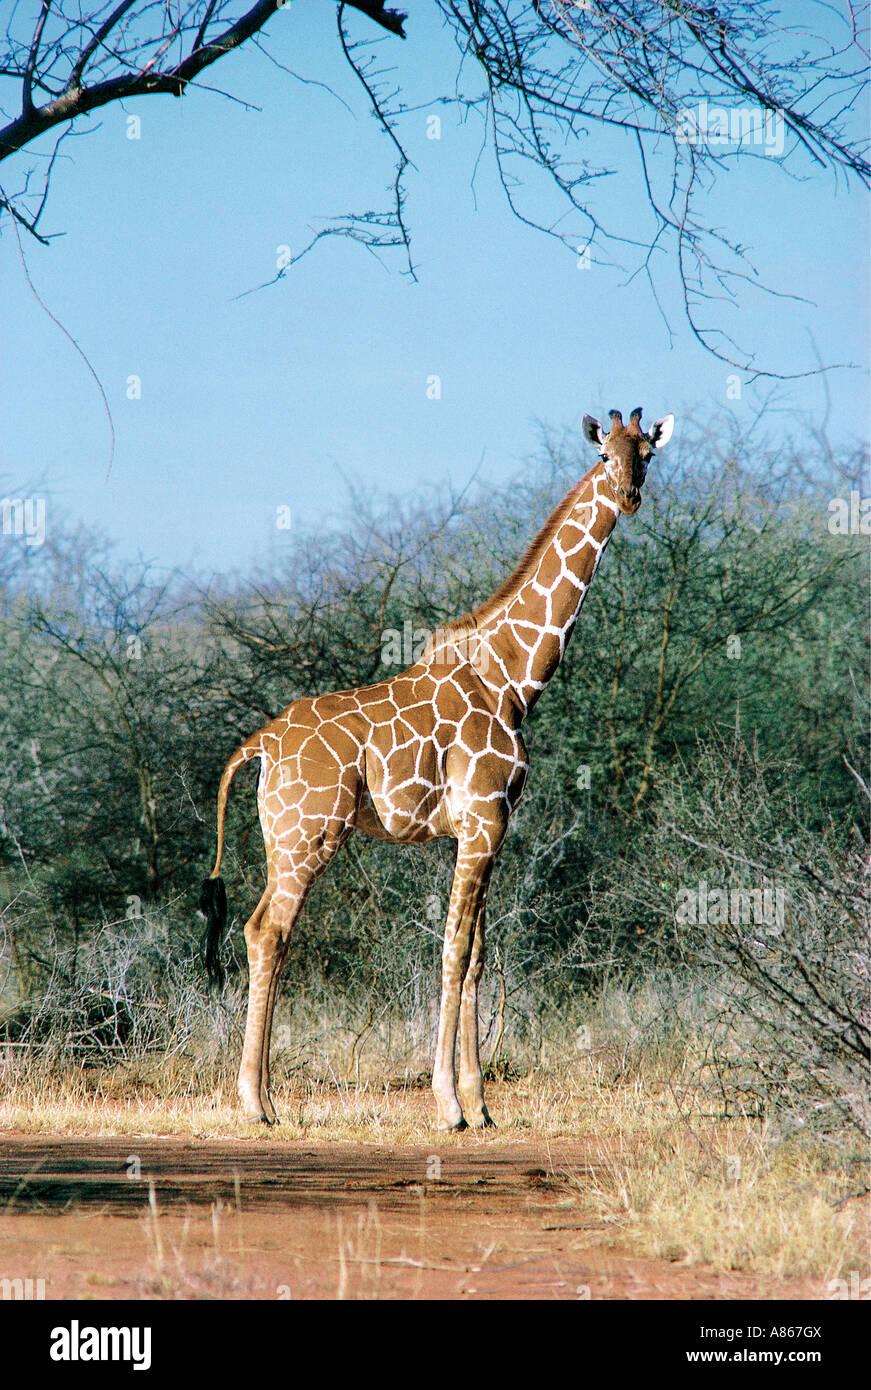 Giraffa reticolata Samburu Riserva nazionale del Kenya Immagini Stock